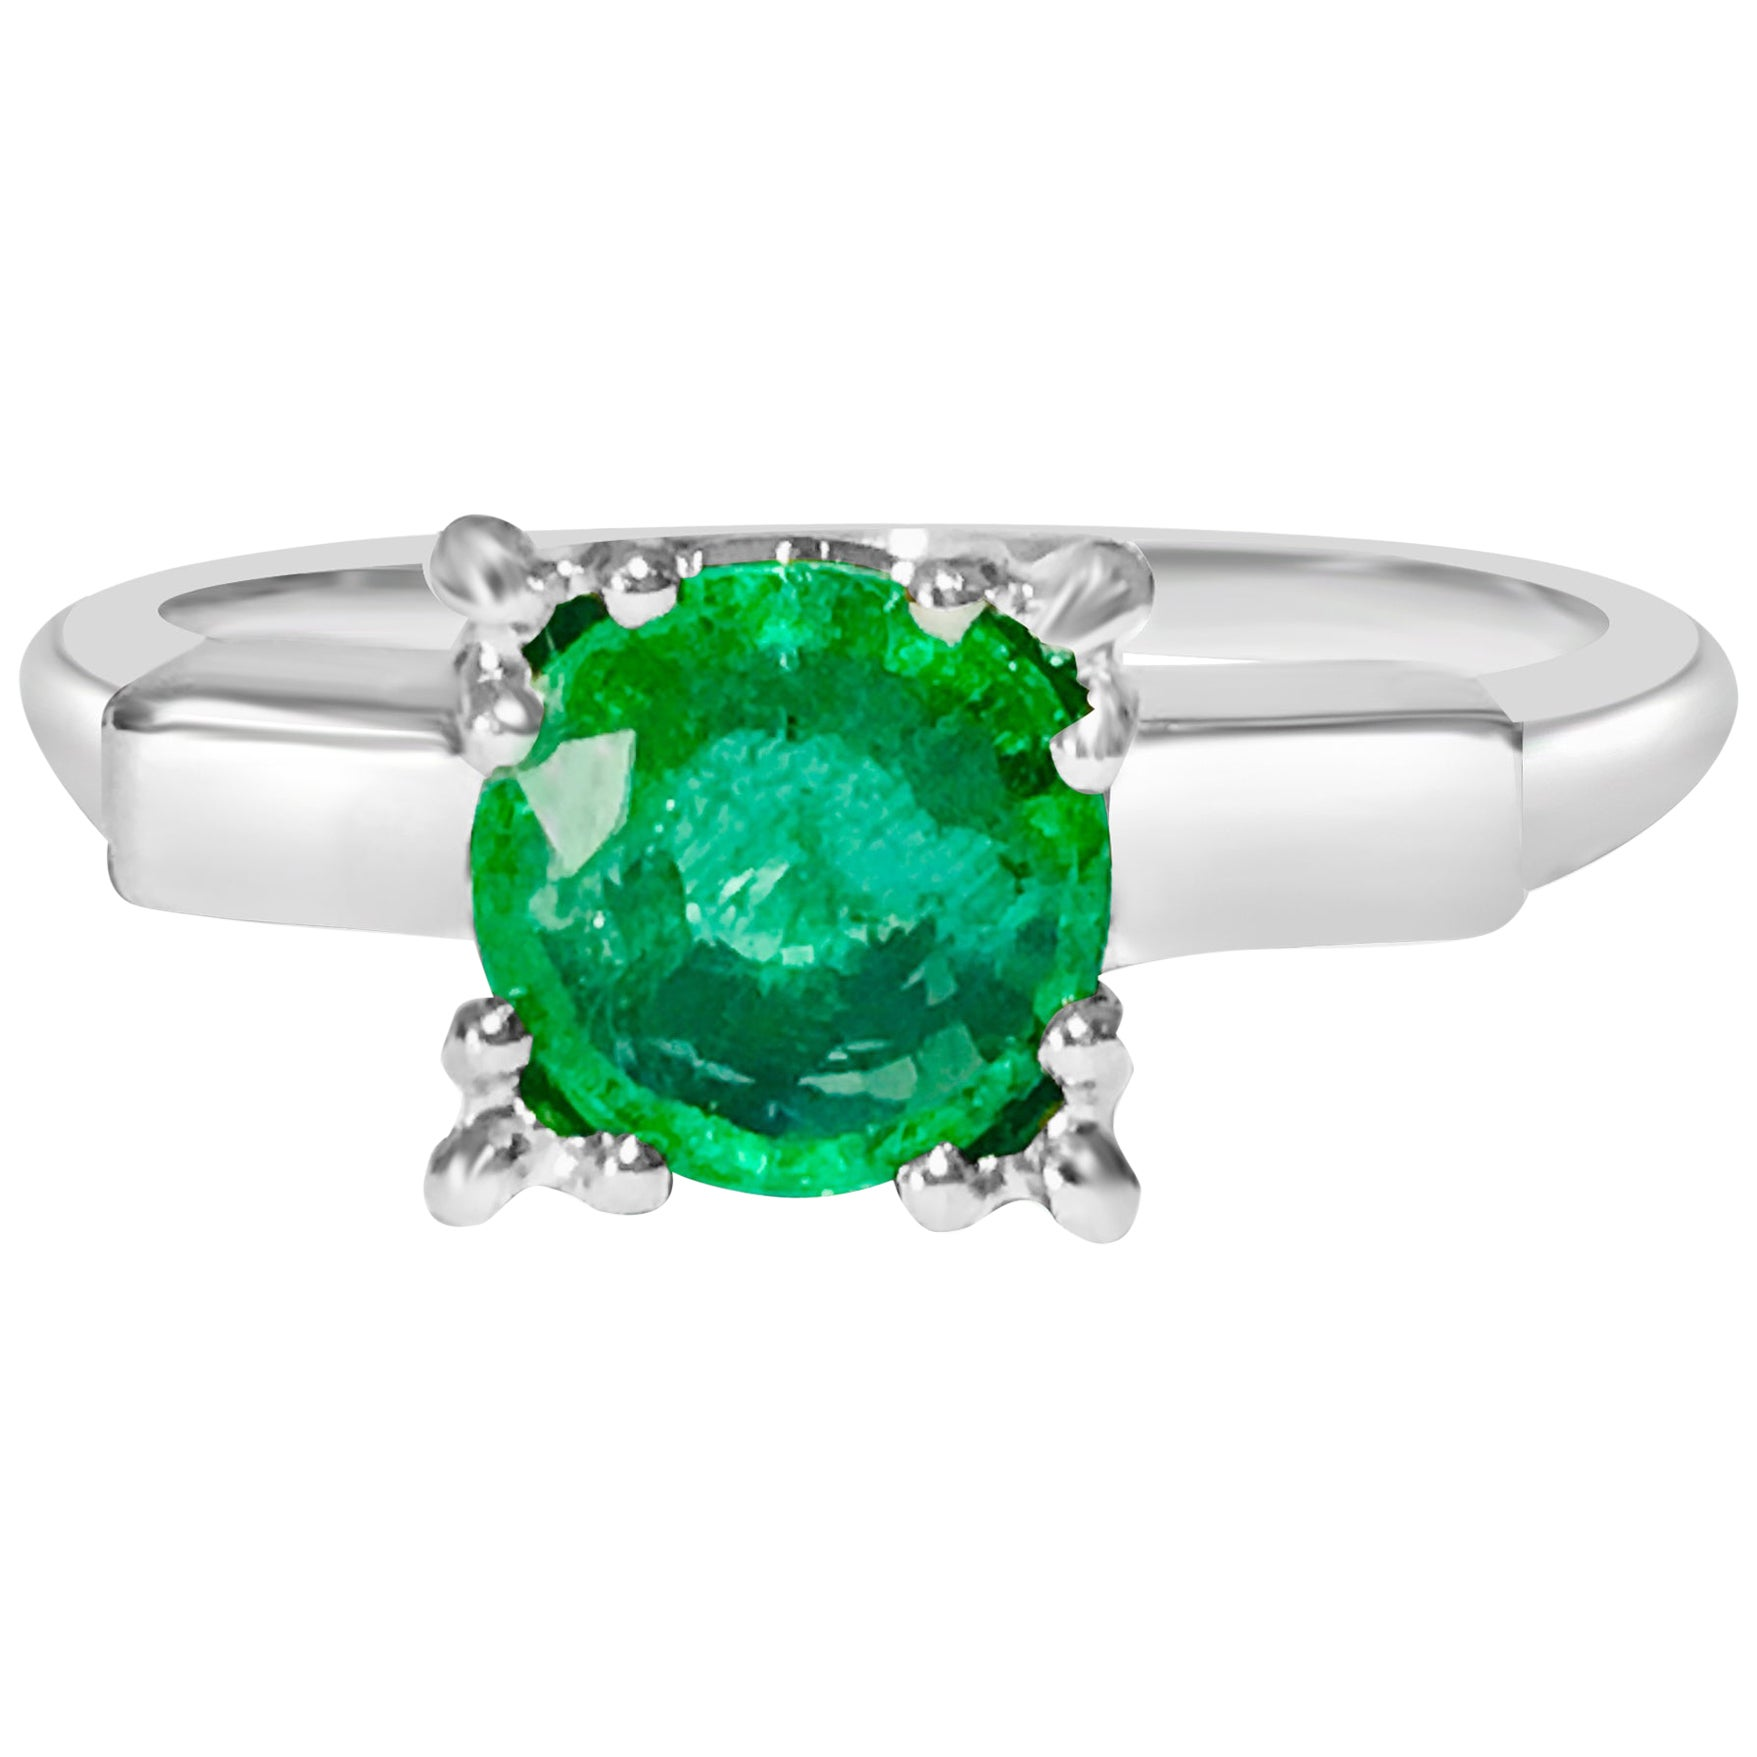 GIA Certified Solitaire 2.00 Carat Emerald Platinum Wedding Ring